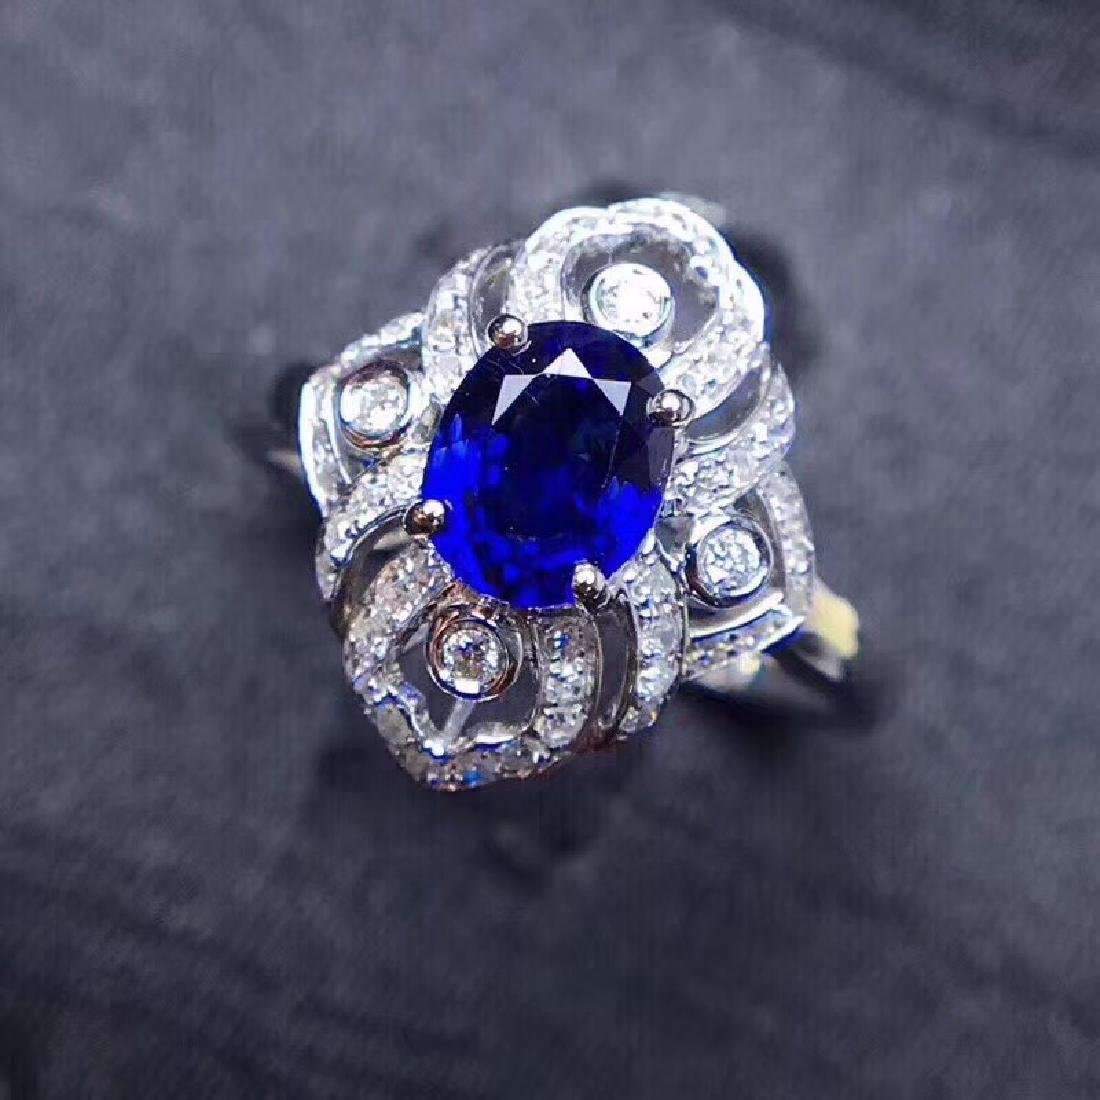 1.18 CTW Sapphire & VS Diamond Ring 18K - 8